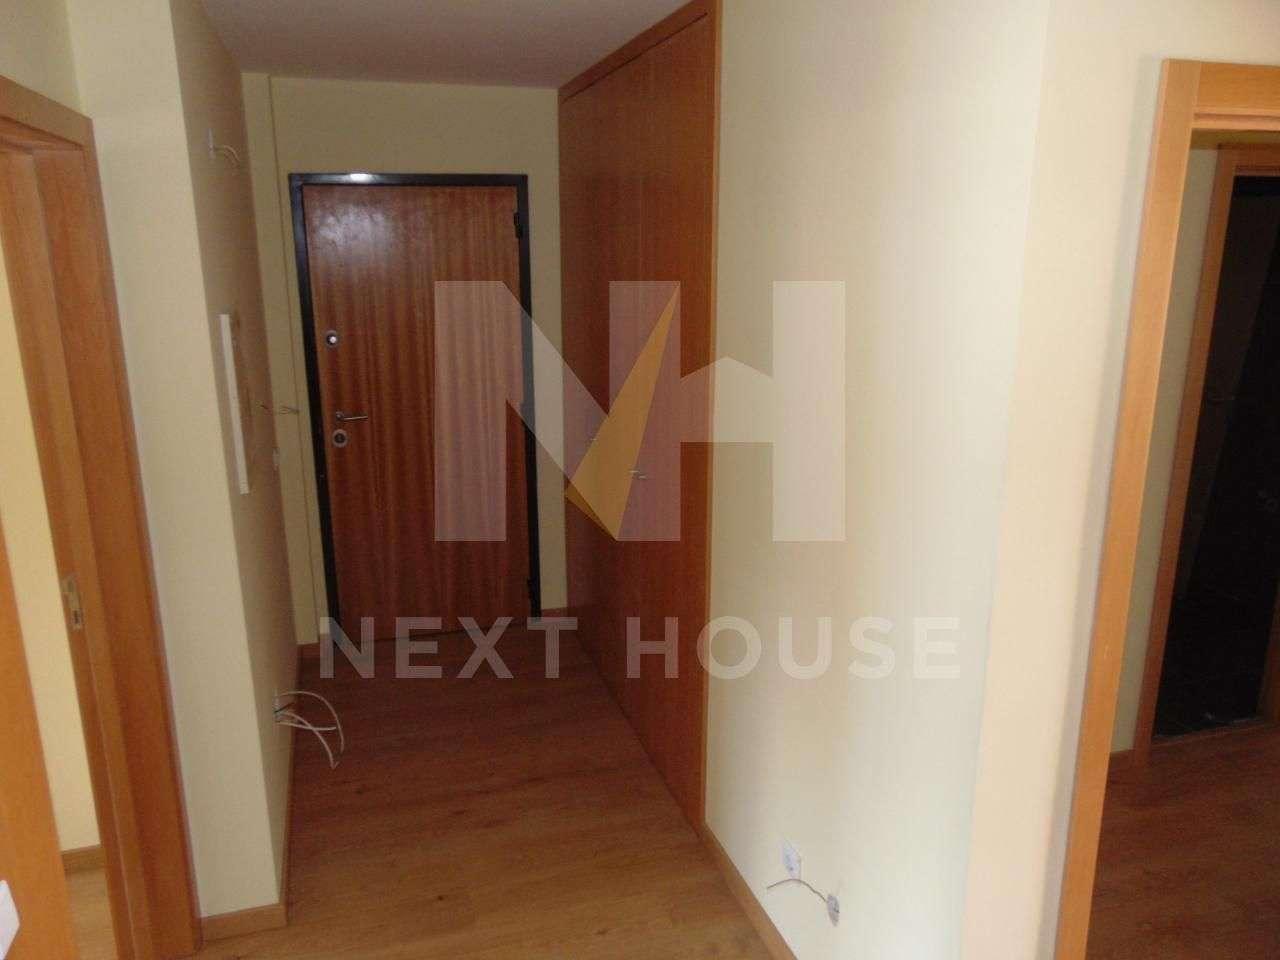 Apartamento para comprar, Gafanha da Boa Hora, Aveiro - Foto 16